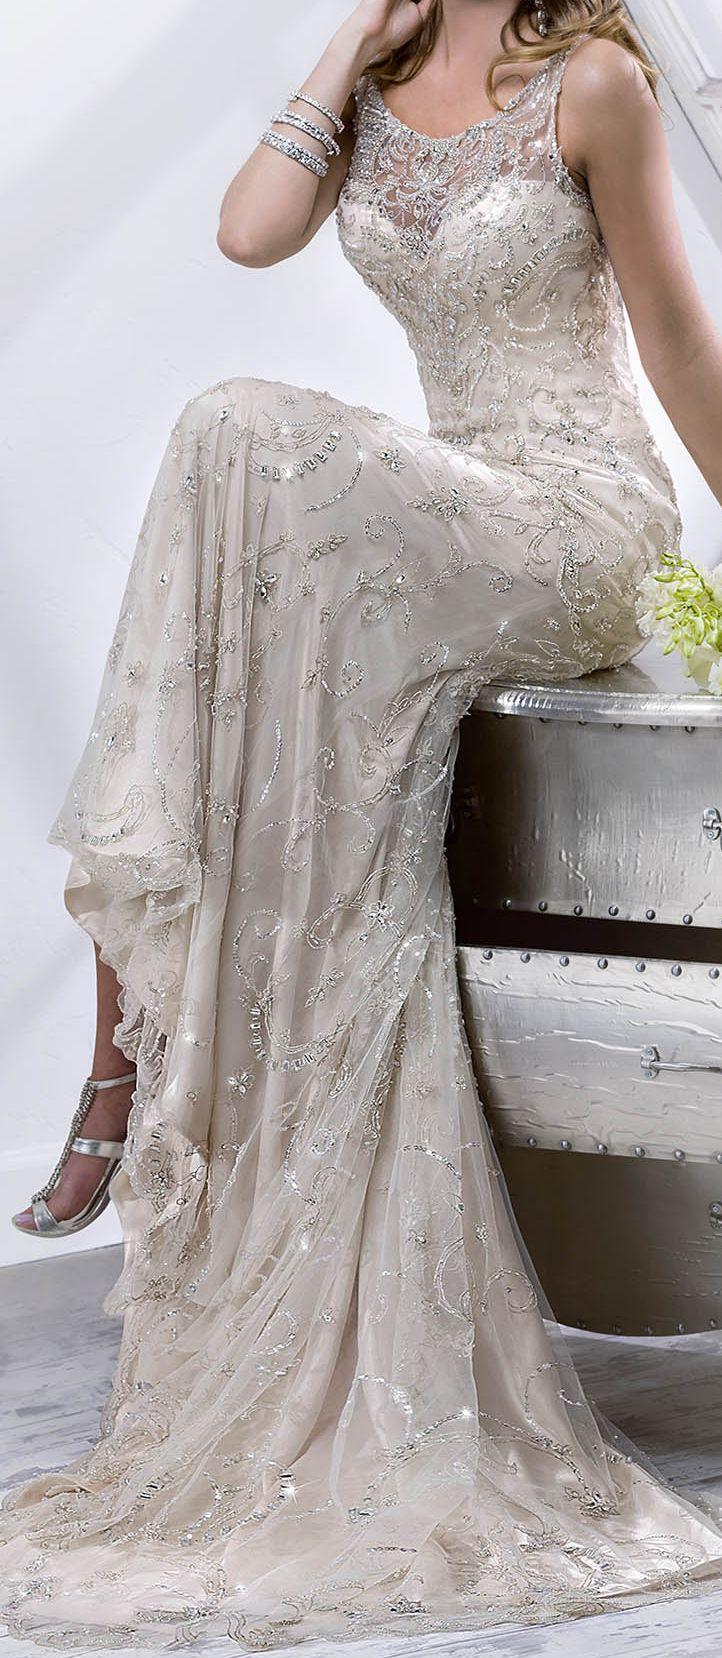 http://www.sotteroandmidgley.com/dress.aspx?style=4SS826